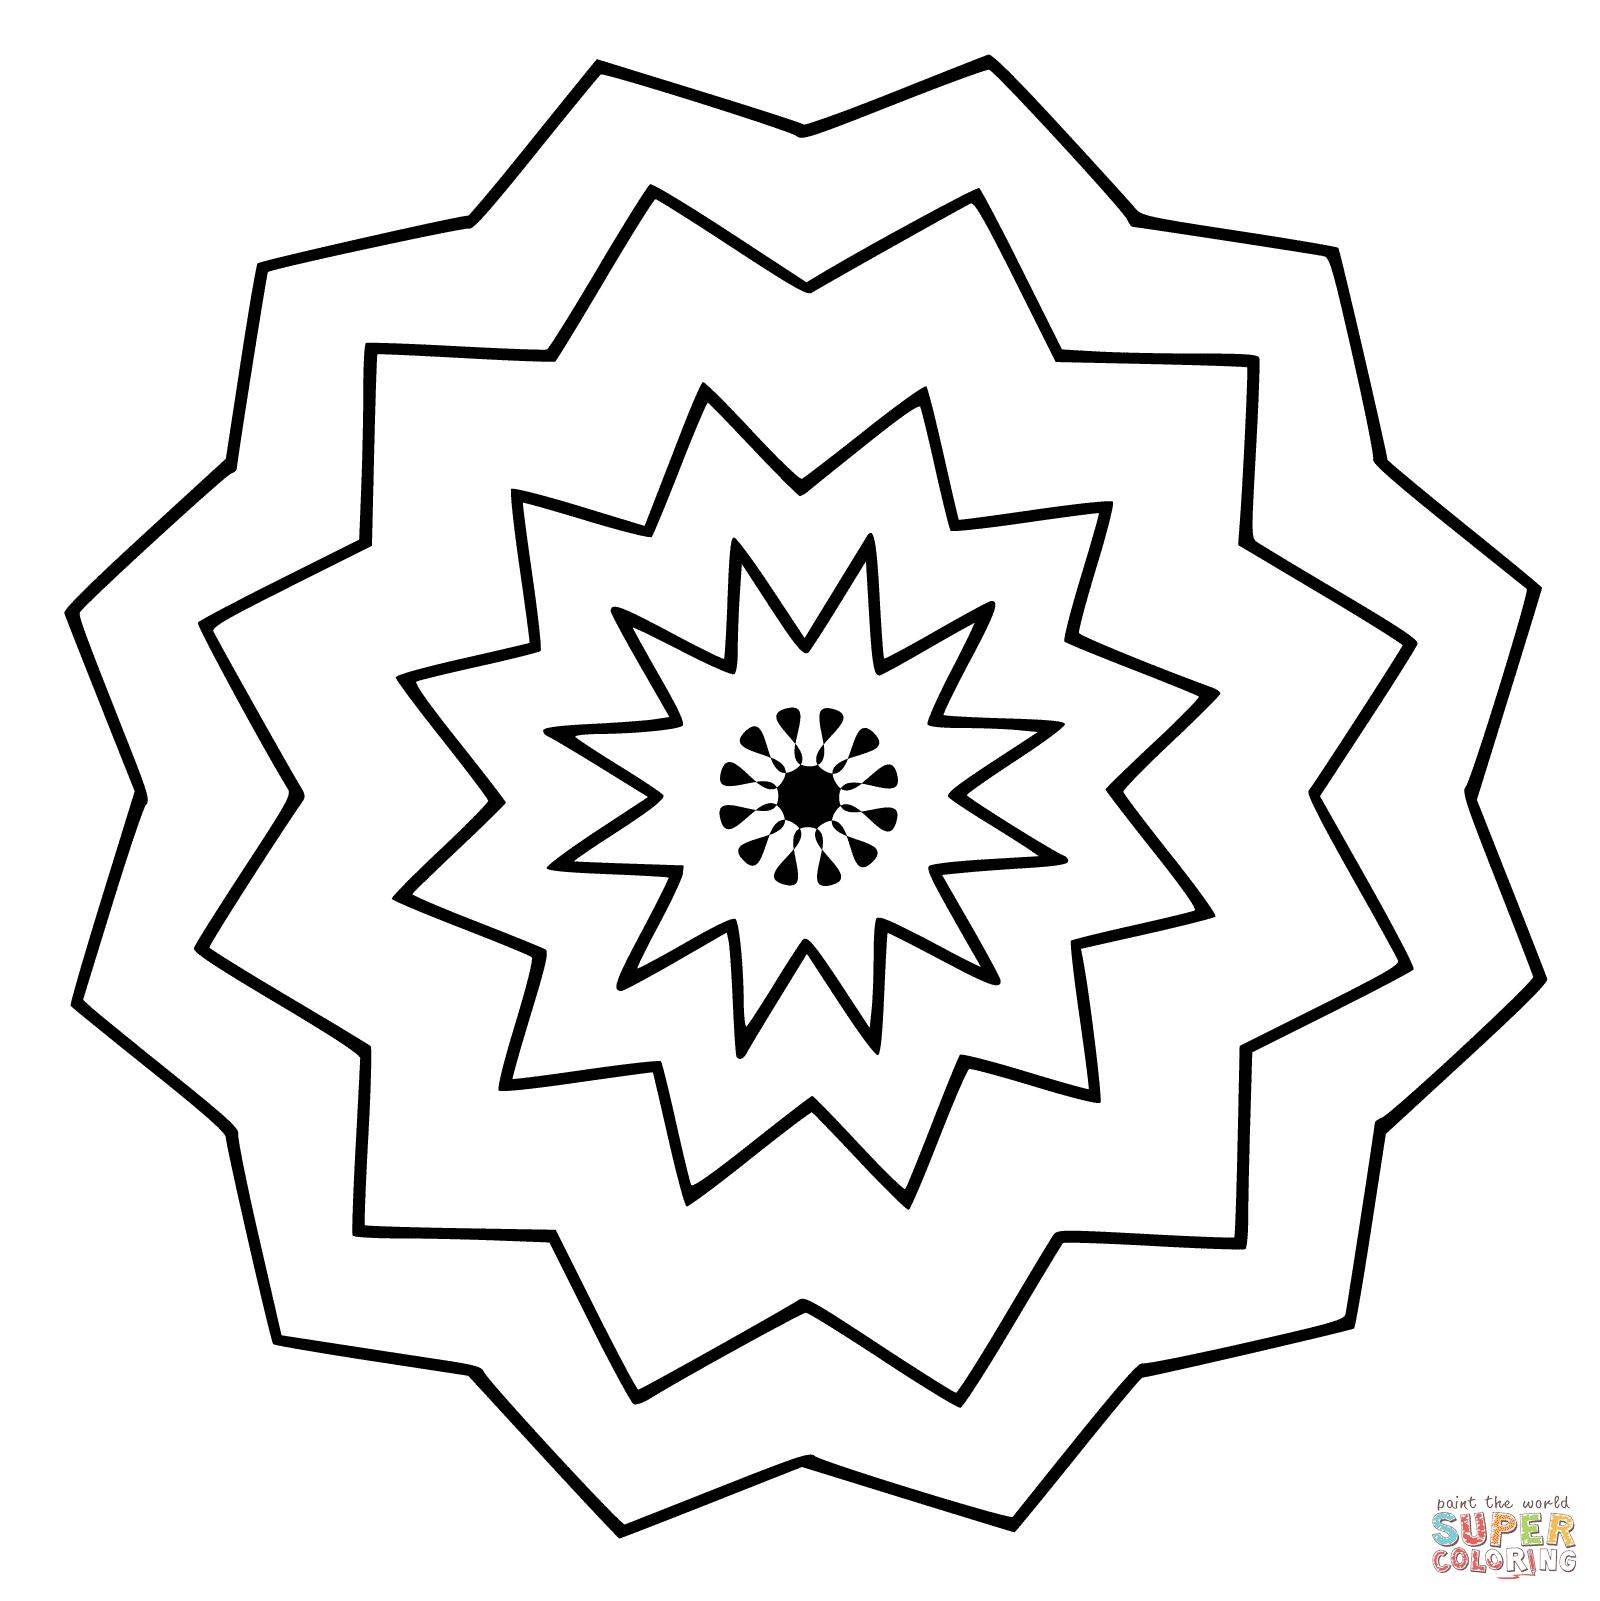 Klick das Bild Blumen Mandala